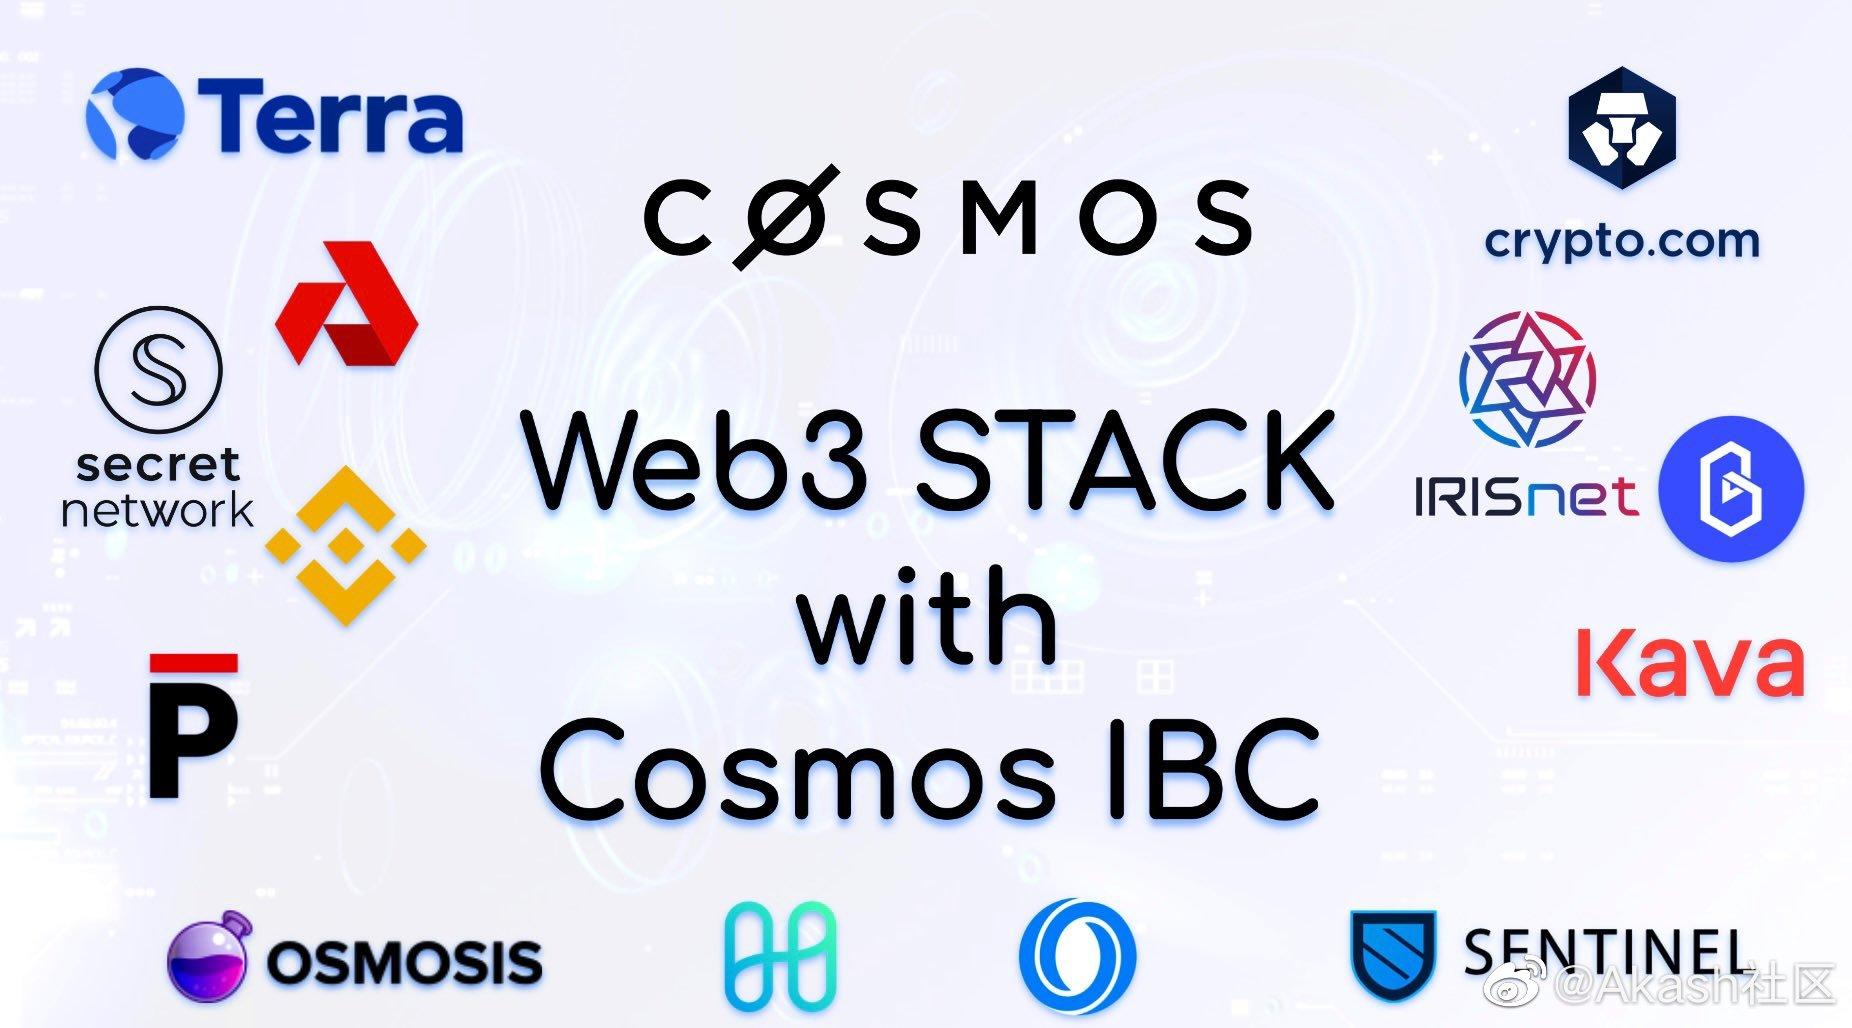 Cosmos生态构建的Web3生态初现端倪!